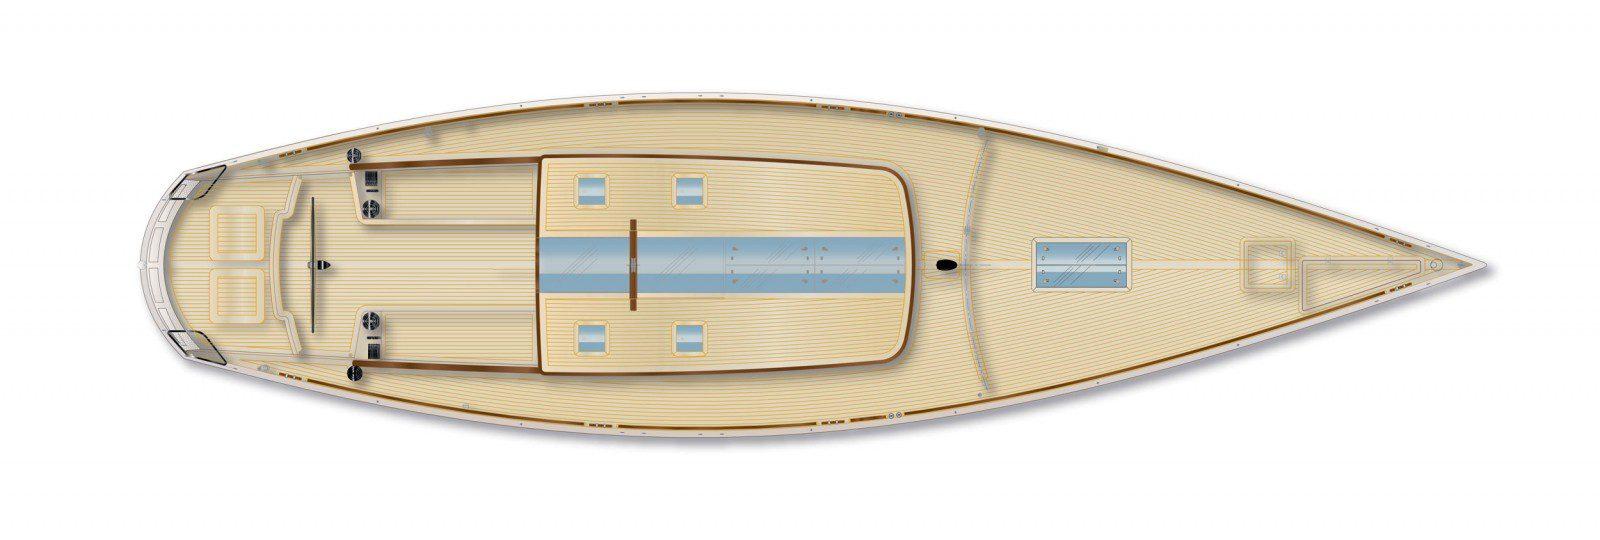 McCONAGHY classic 57 deck plan